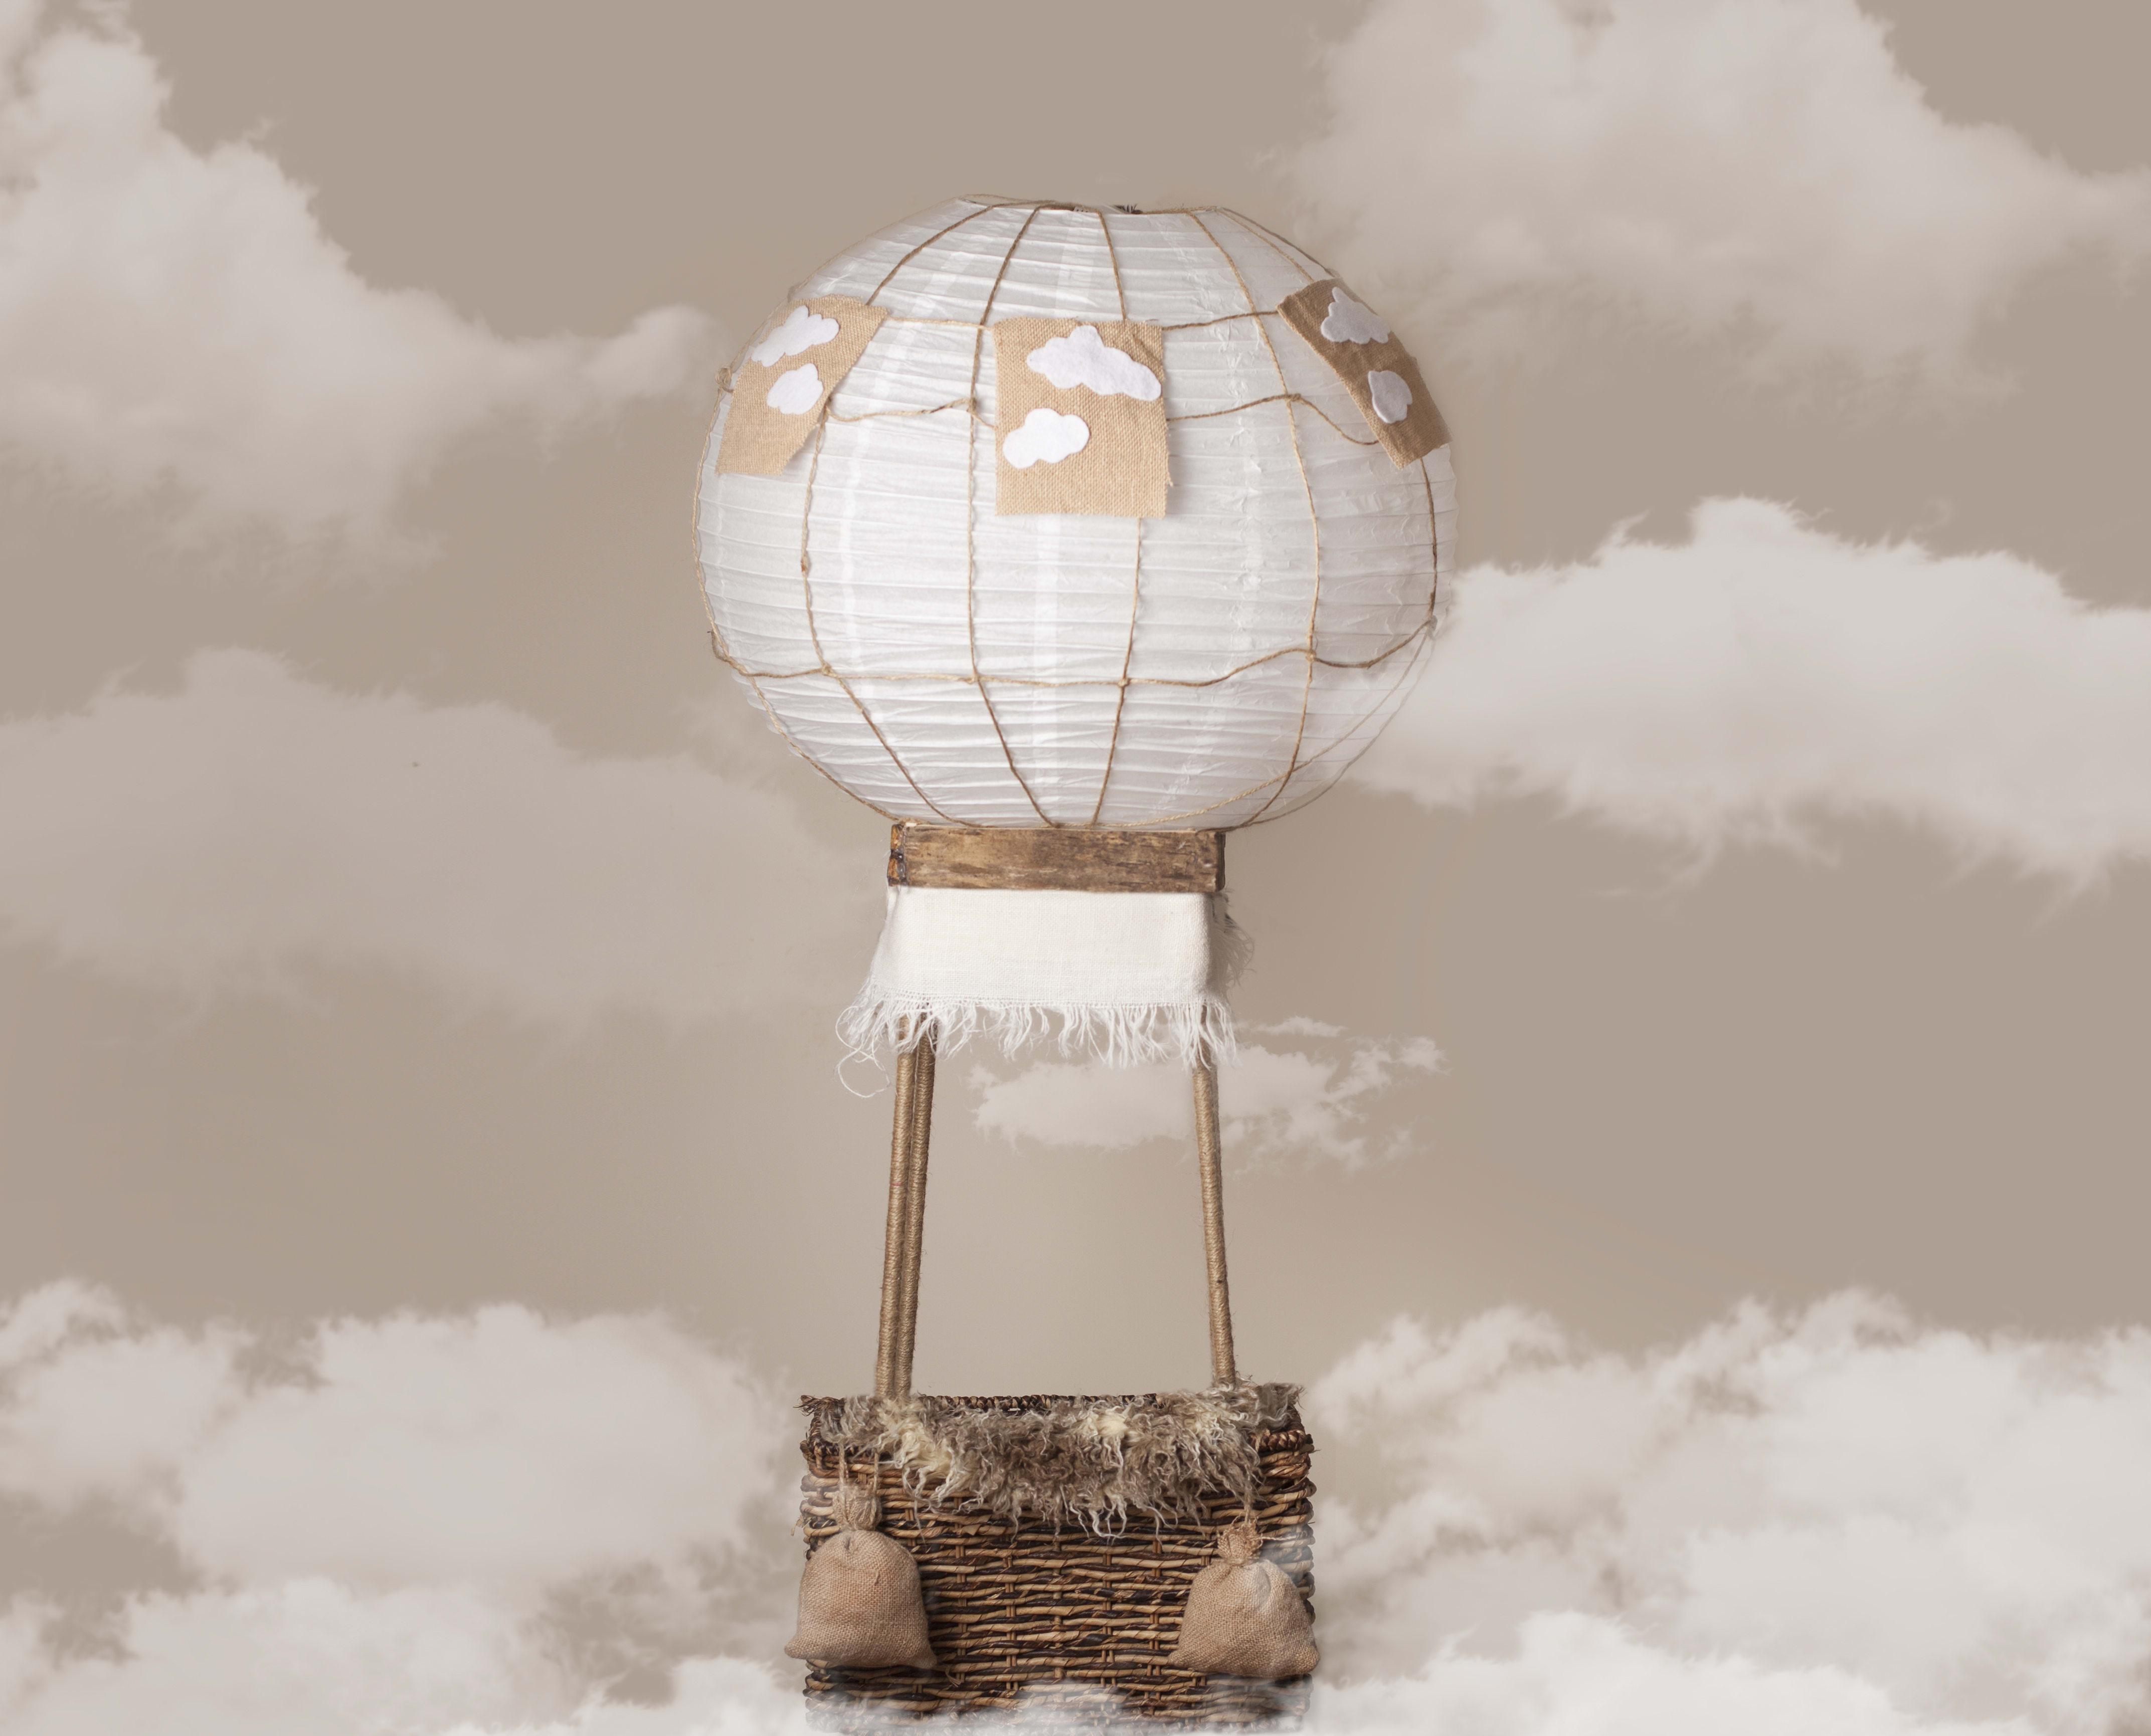 Digital Backdrops Props Newborn Hot Air Balloon 4 Digital Downloads By Zemlyanskiy1958